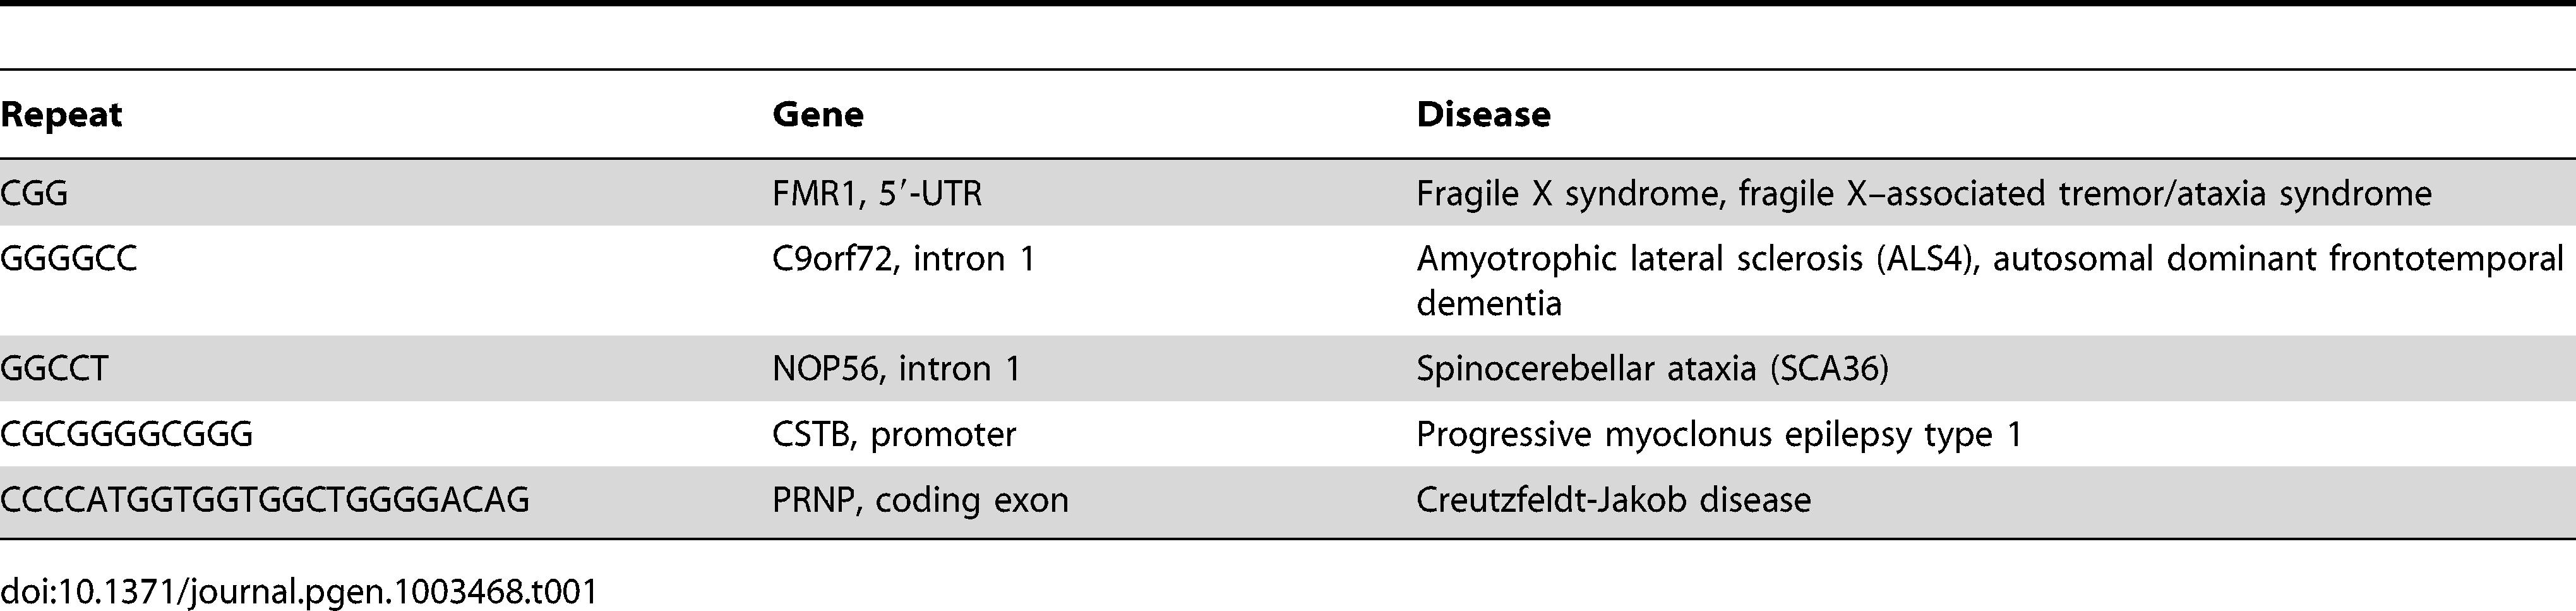 G4 motif expansions in neurological disease.